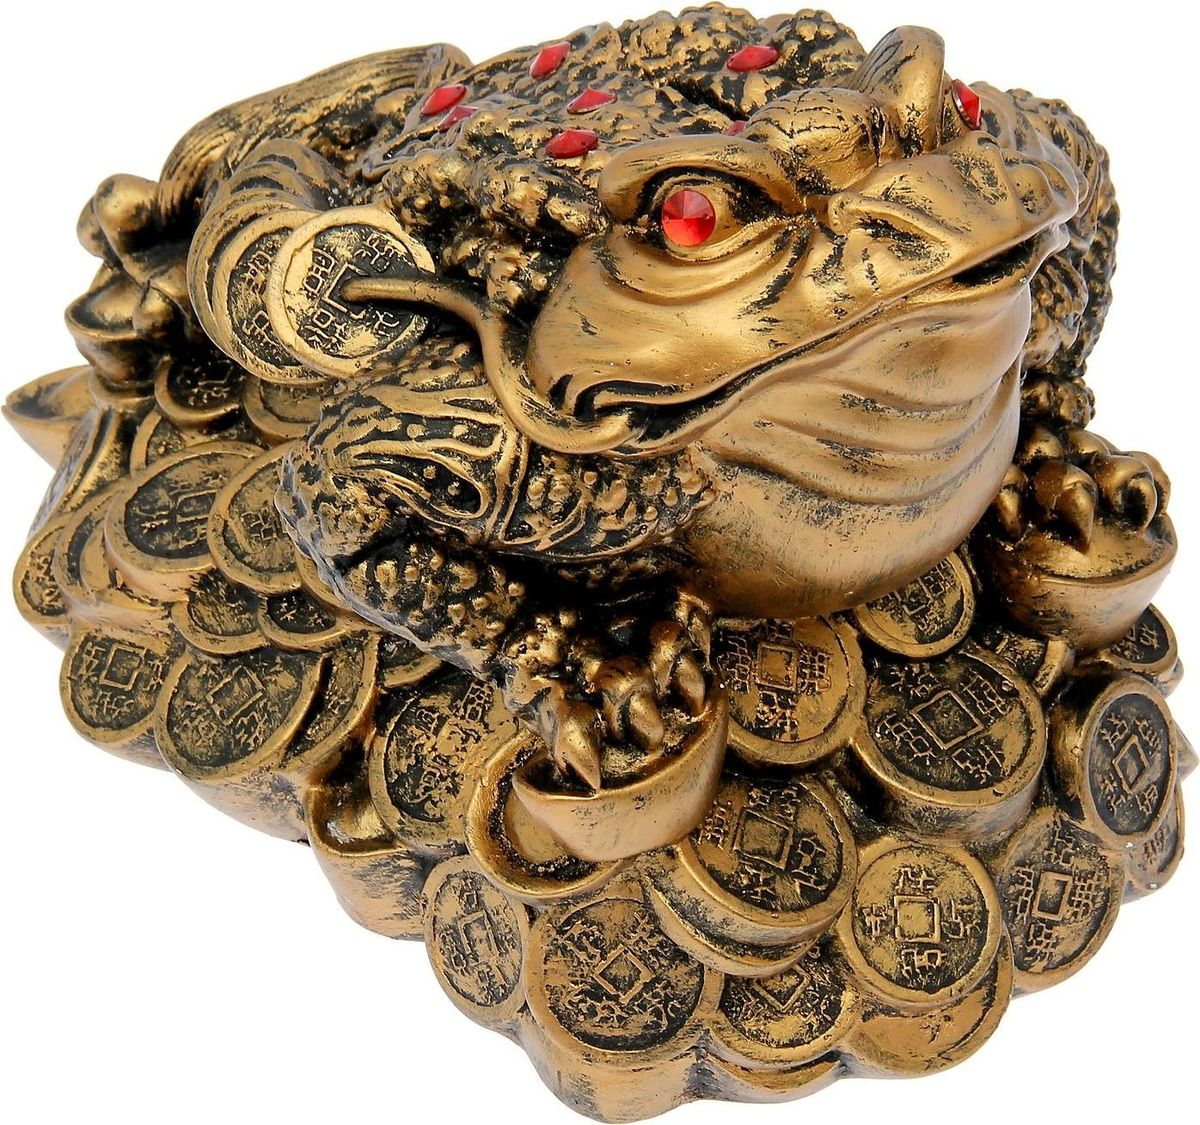 Копилка Premium Gips Денежная жаба, 33 х 23 х 25 см копилка premium gips денежная жаба 17 см х 19 см х 17 см